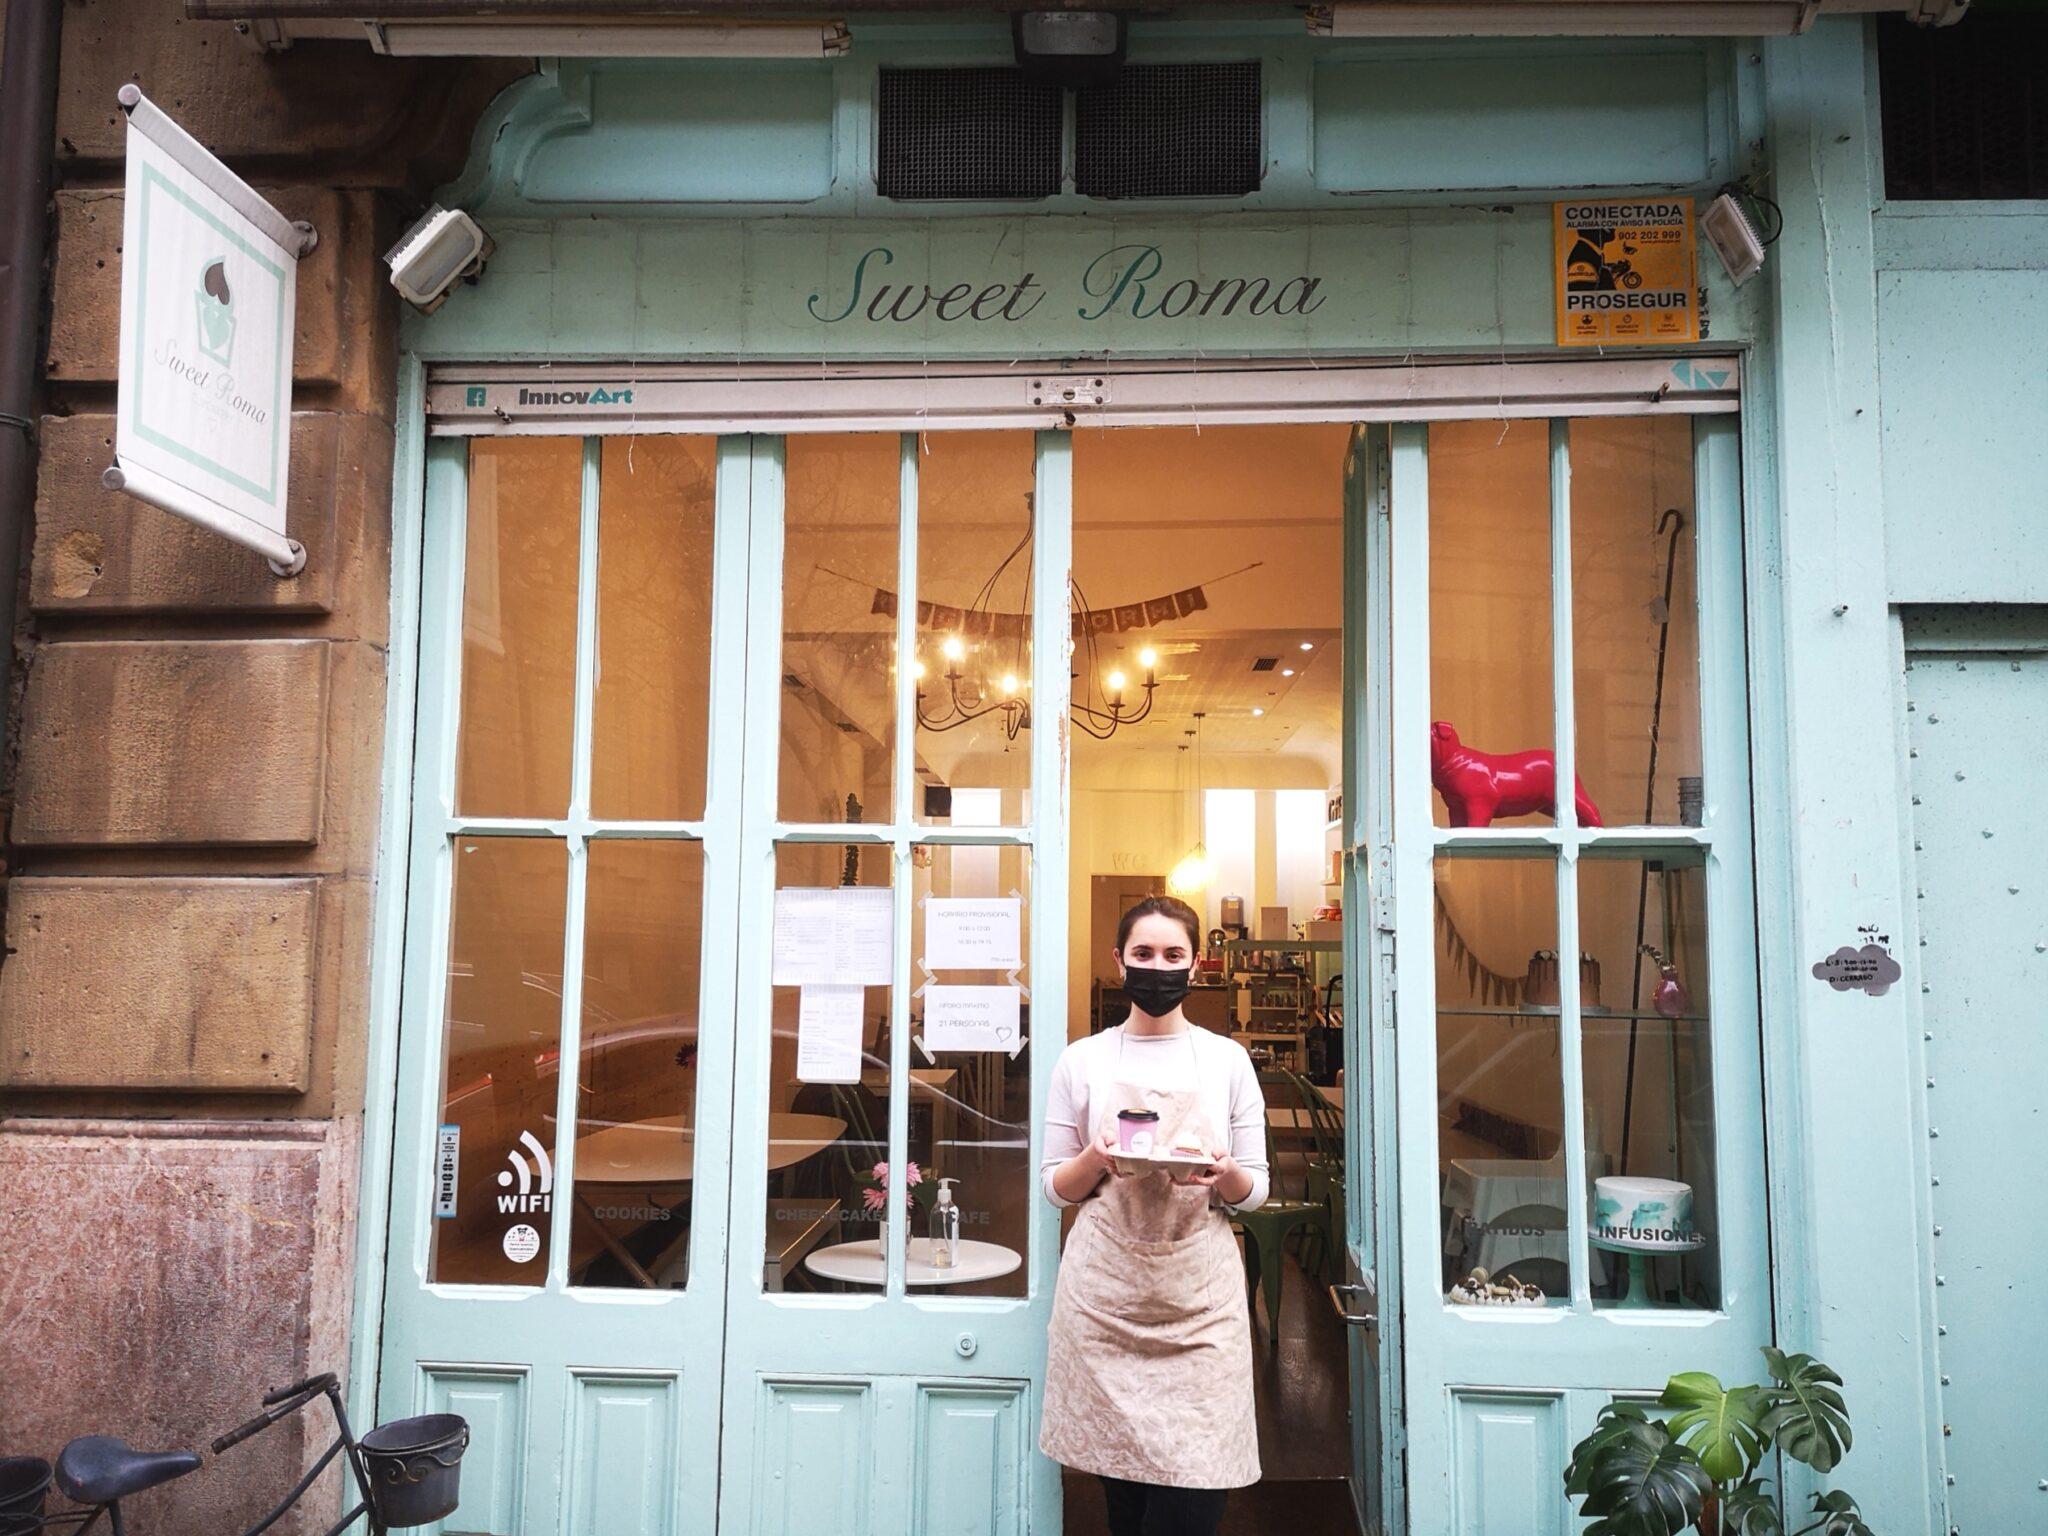 sweetroma scaled - Donostia, ahora, se recorre café en mano